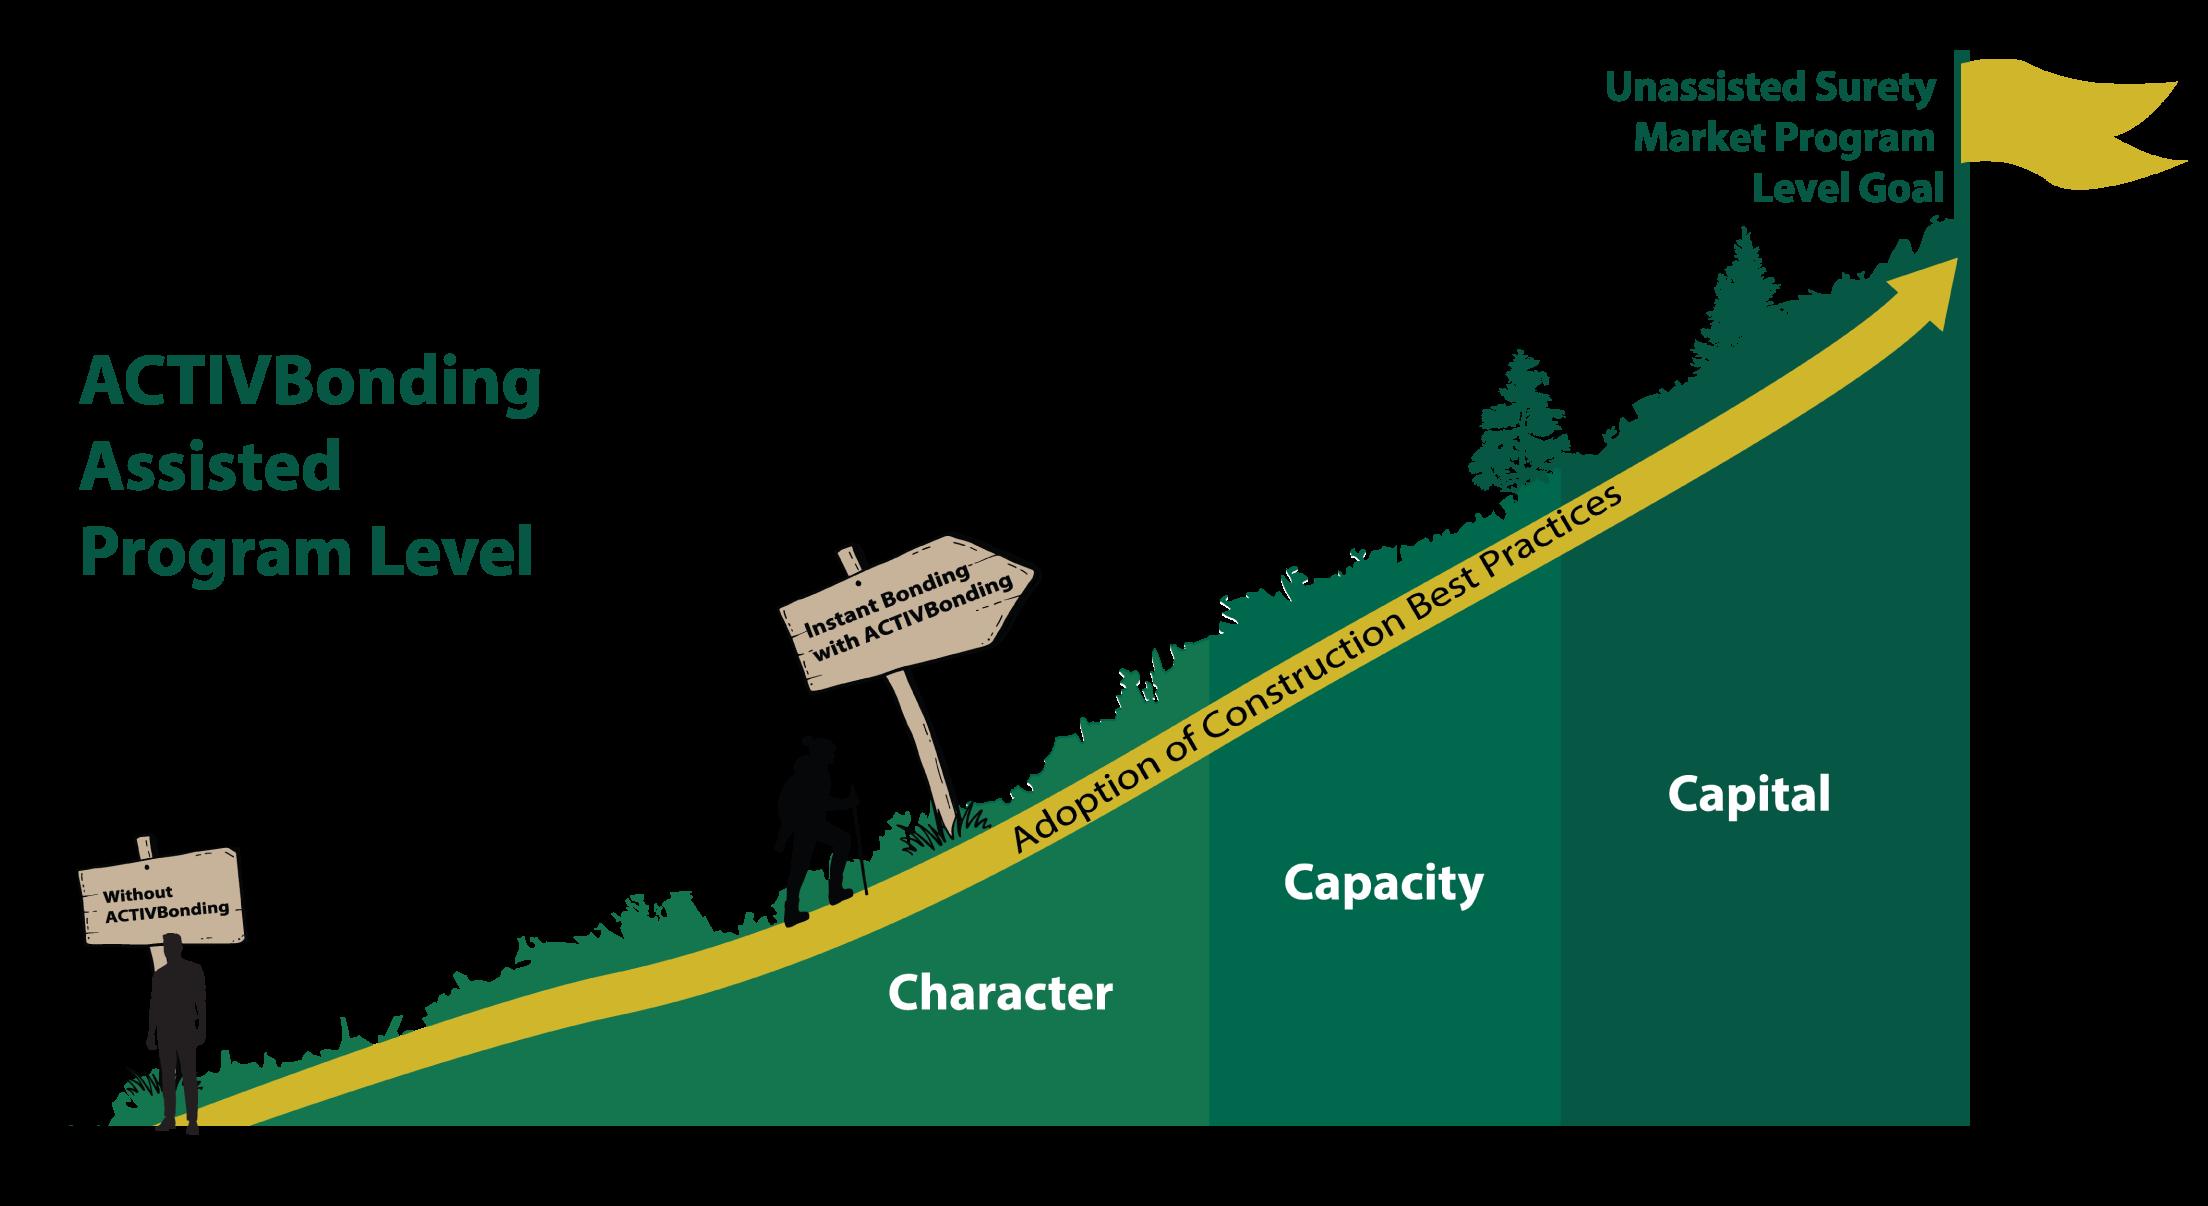 activbonding assisted program level model